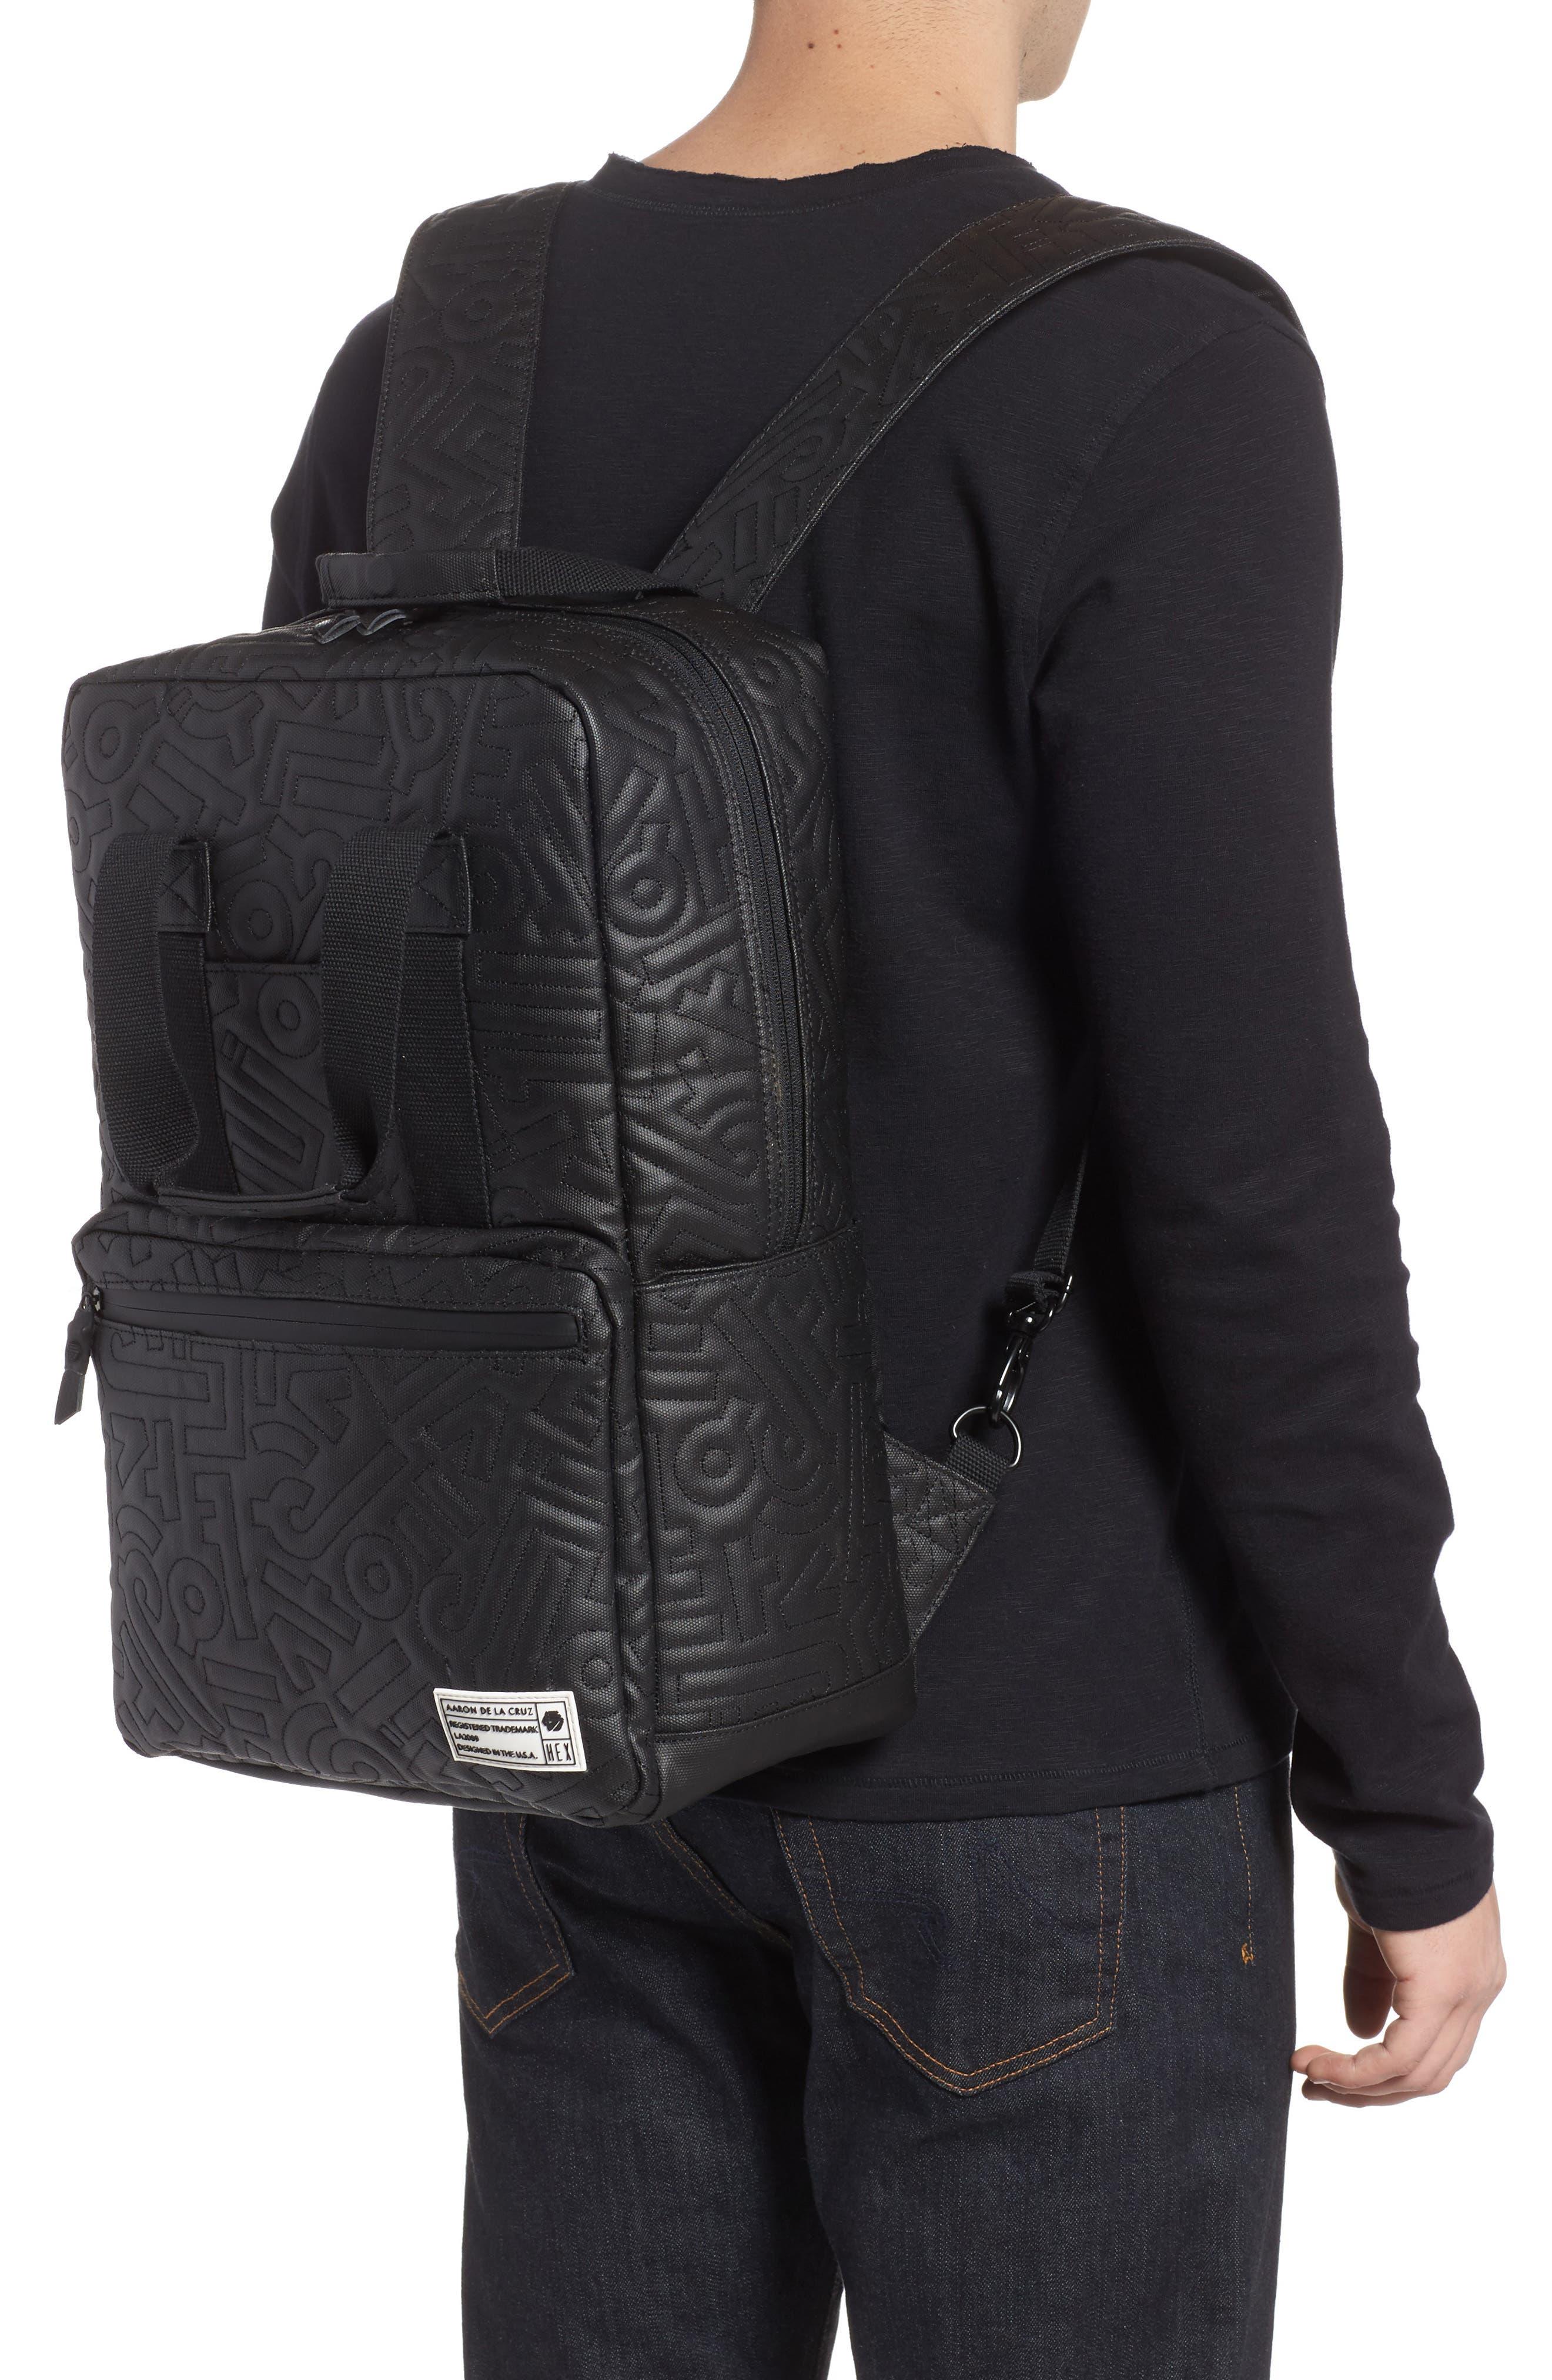 x Aaron De La Cruz Convertible Backpack,                             Alternate thumbnail 2, color,                             003